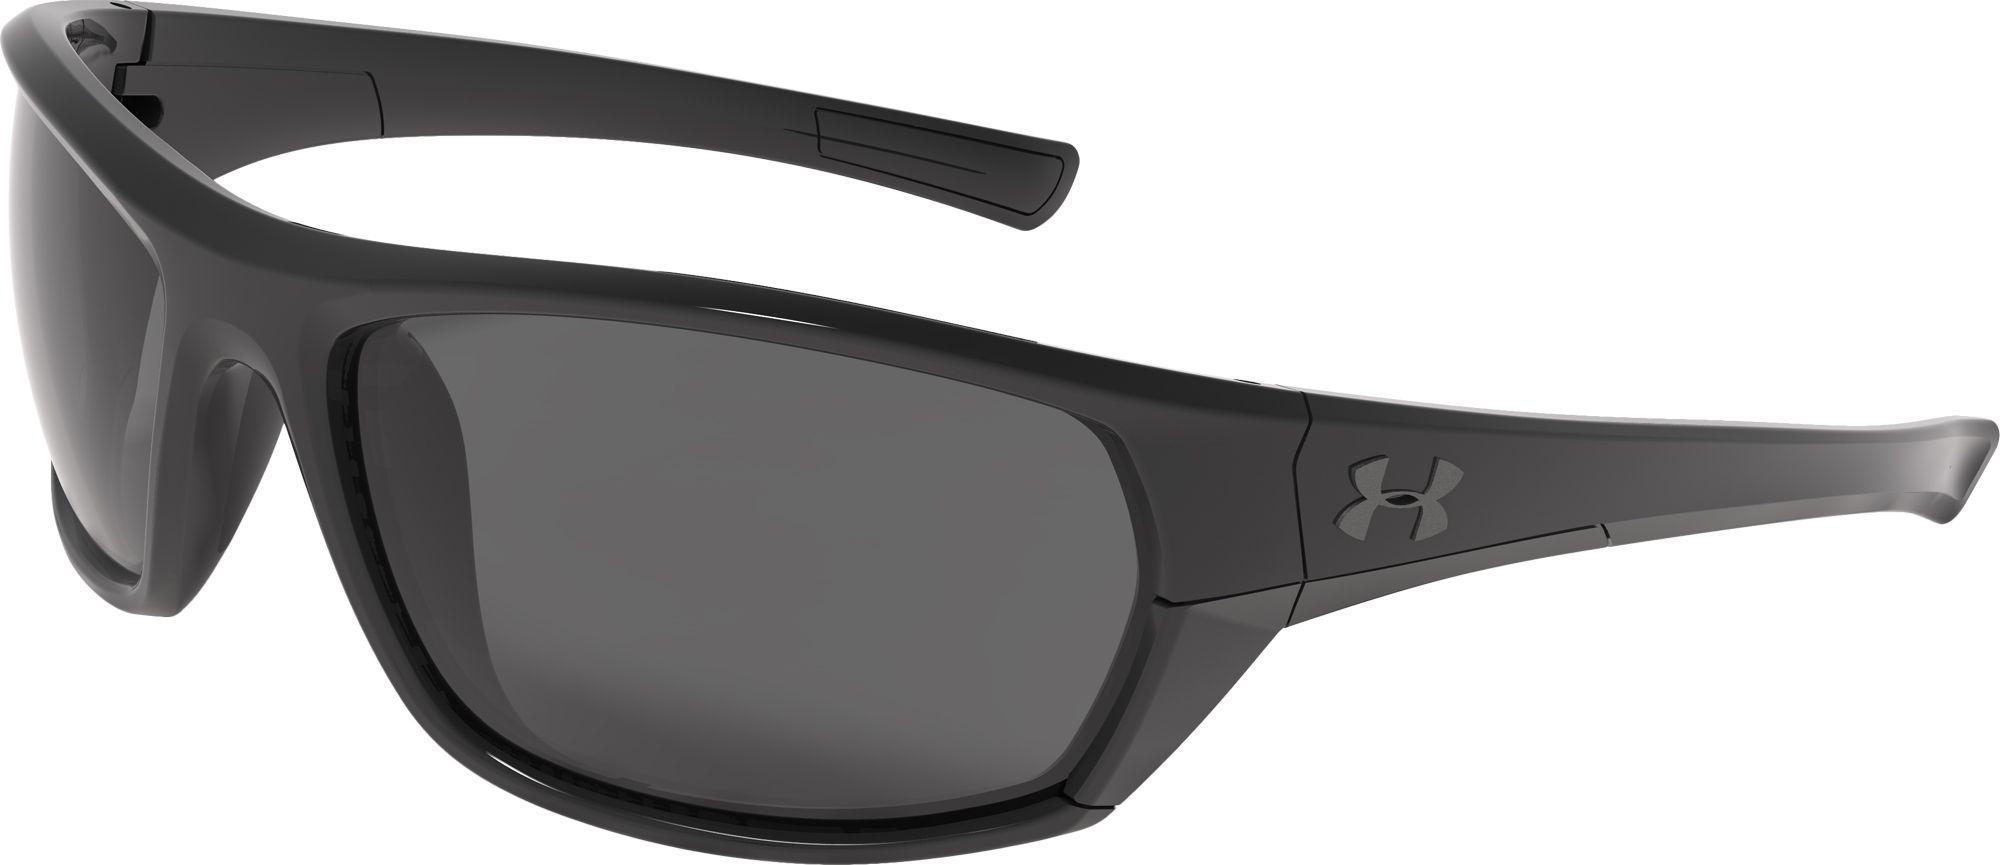 eb3b9d06540 Lyst - Under Armour Powerbrake Storm Polarized Sunglasses in Black ...